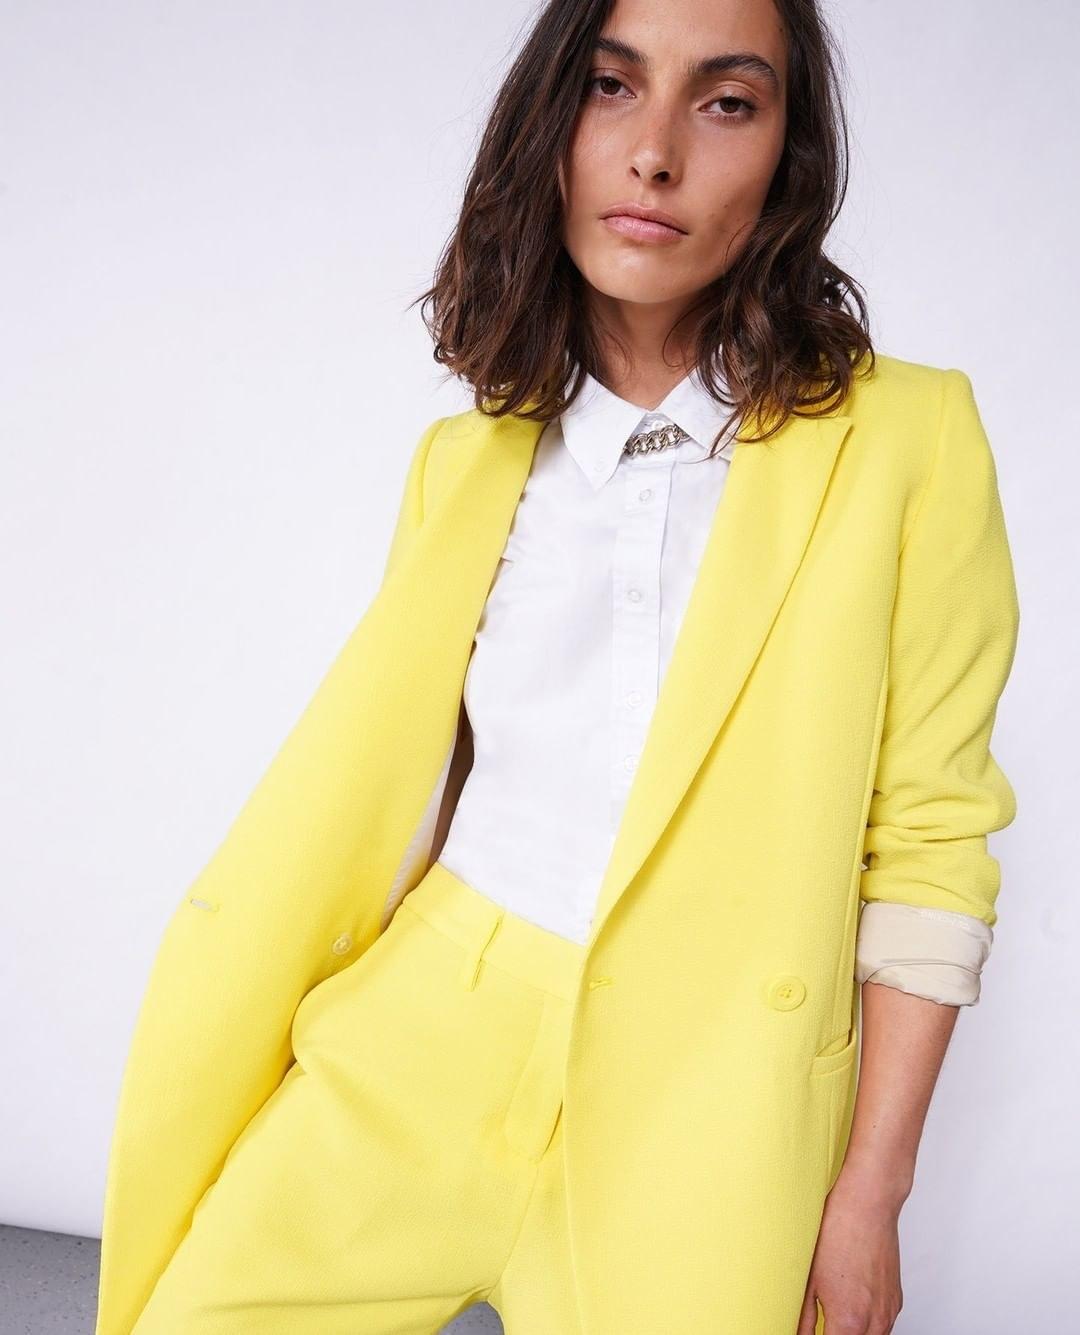 A model wearing a yellow pantsuit